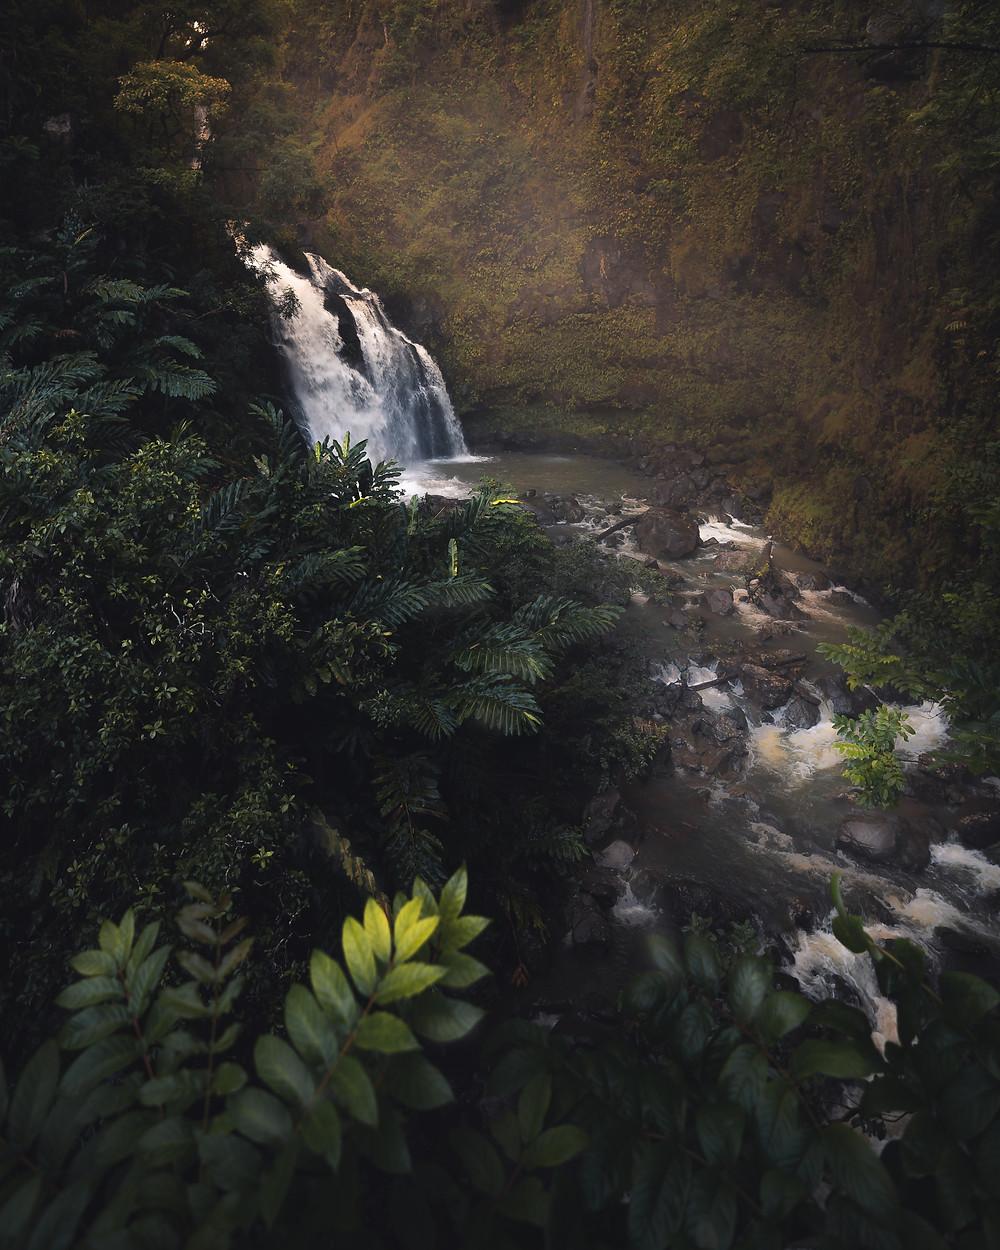 waterfalls and jungle vegetation in sun light